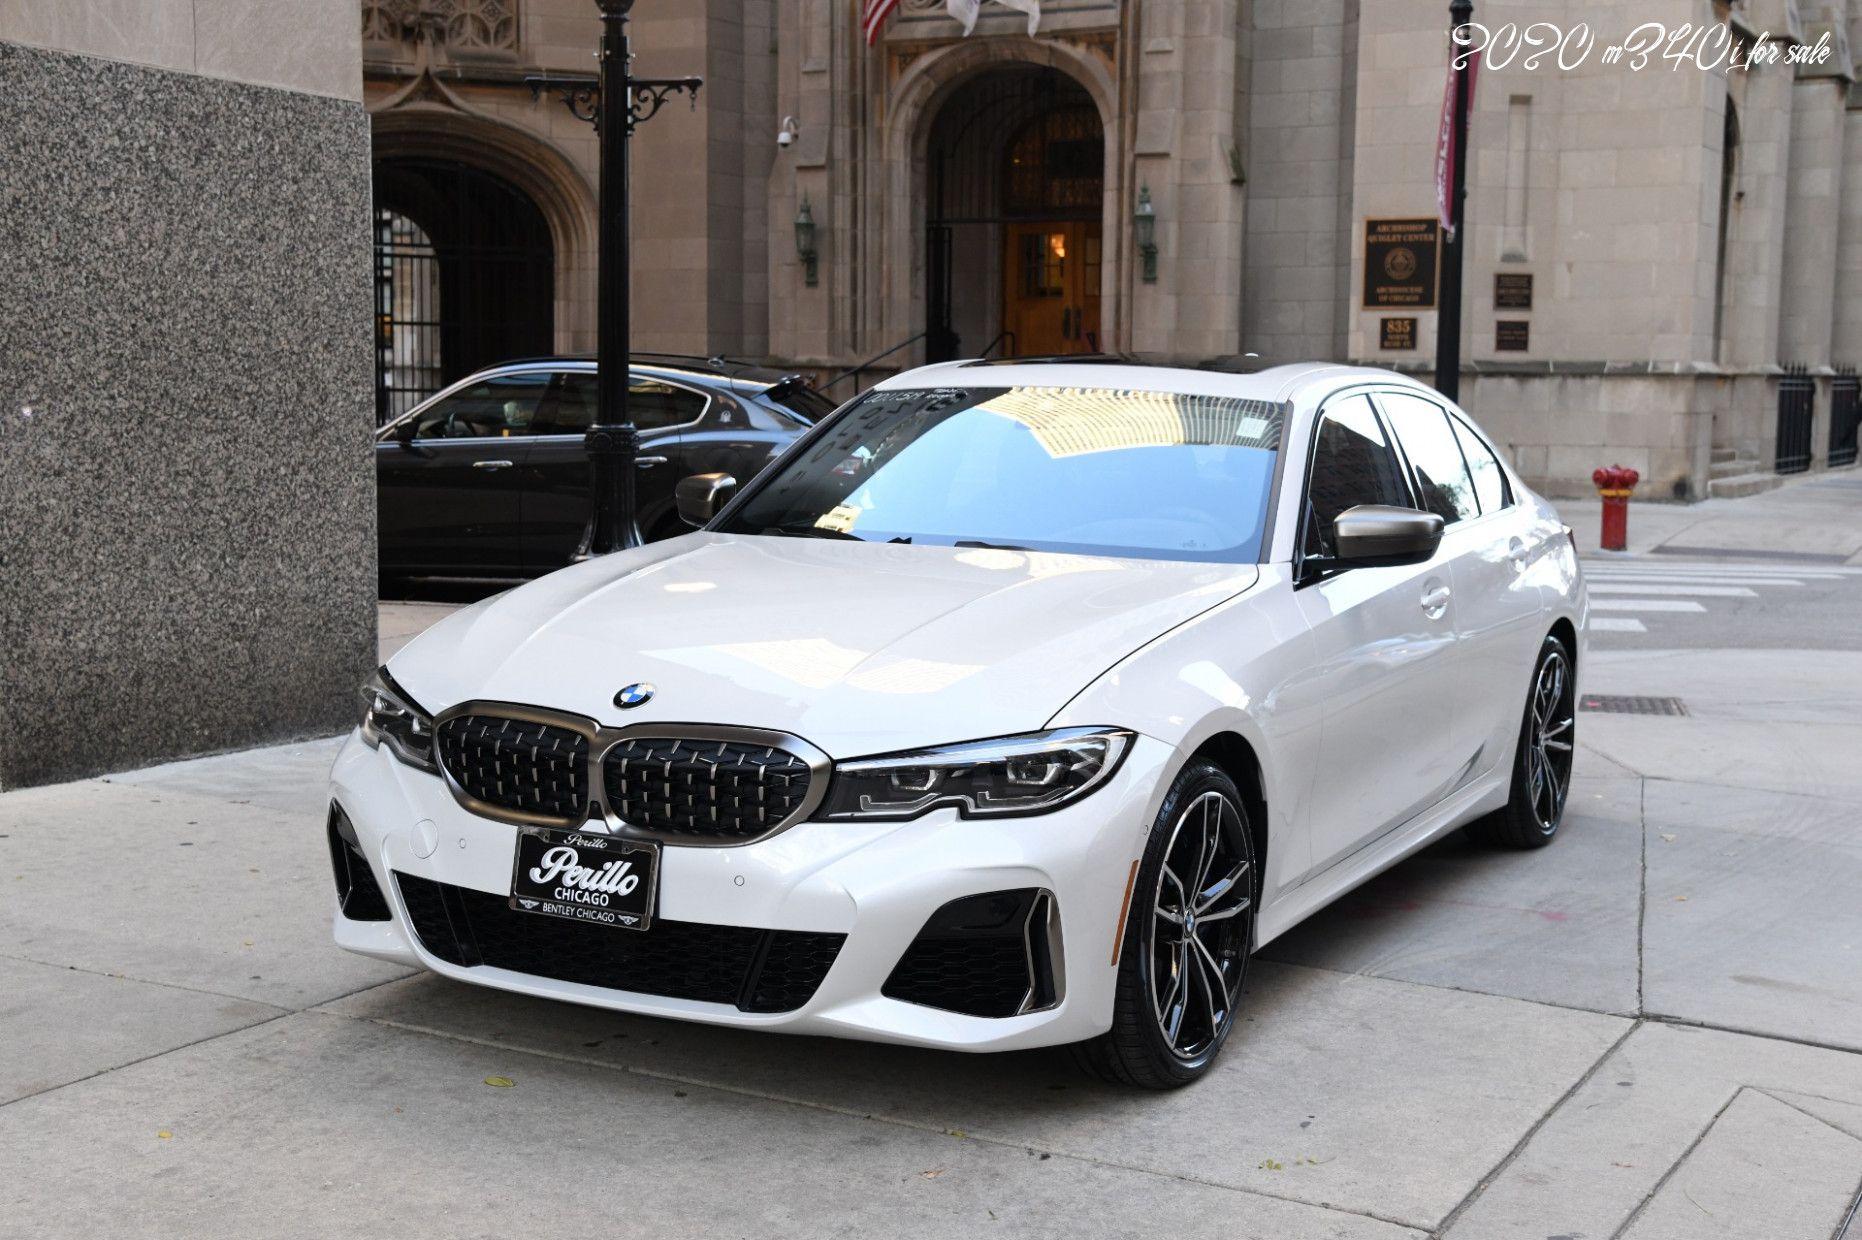 2020 M340i For Sale Style In 2020 Car Bmw Car Bmw